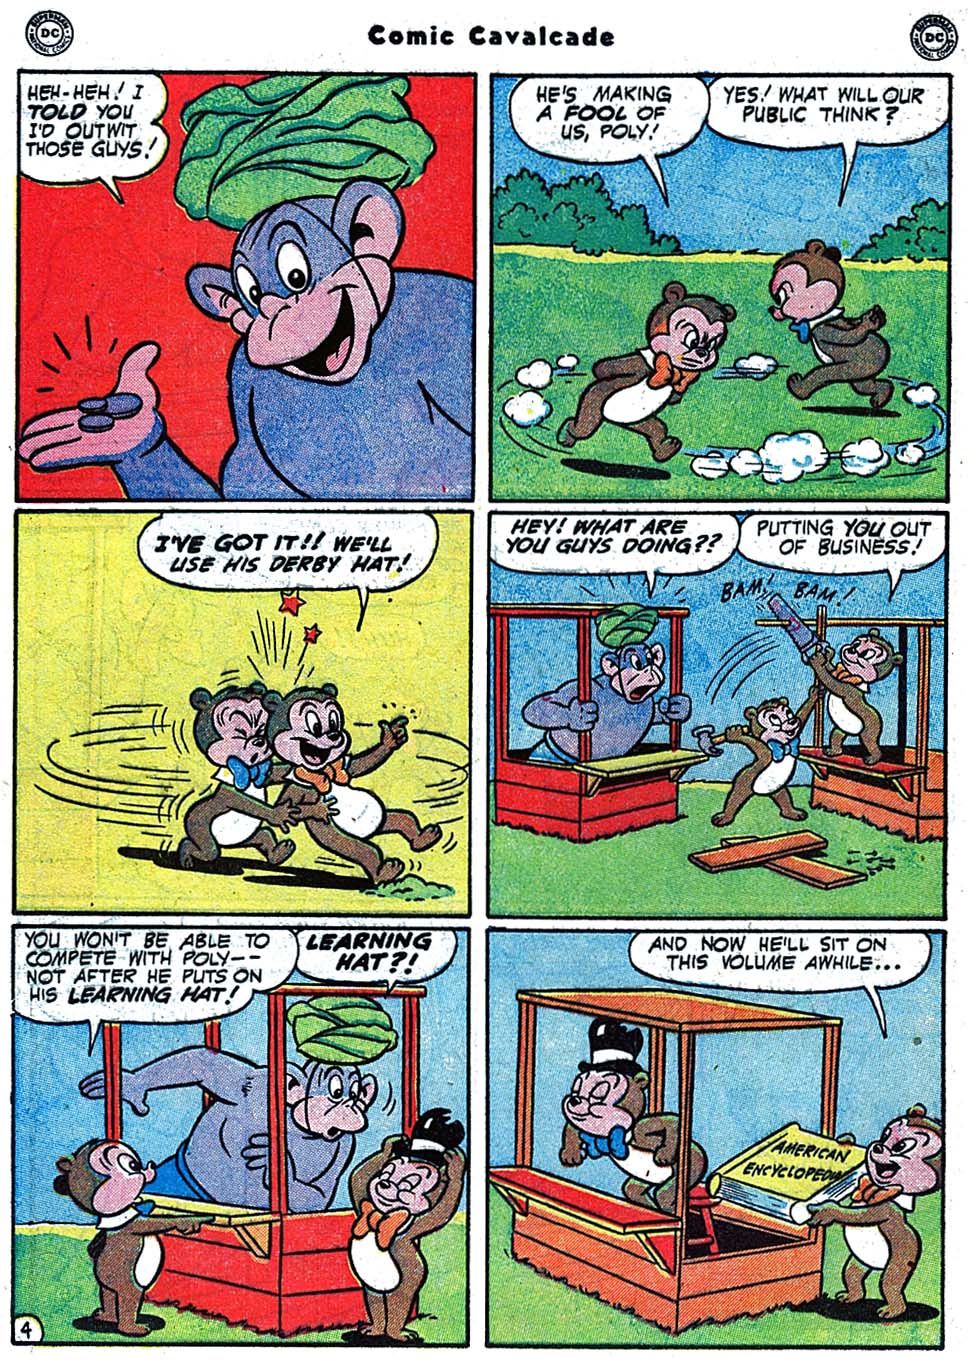 Comic Cavalcade issue 38 - Page 22